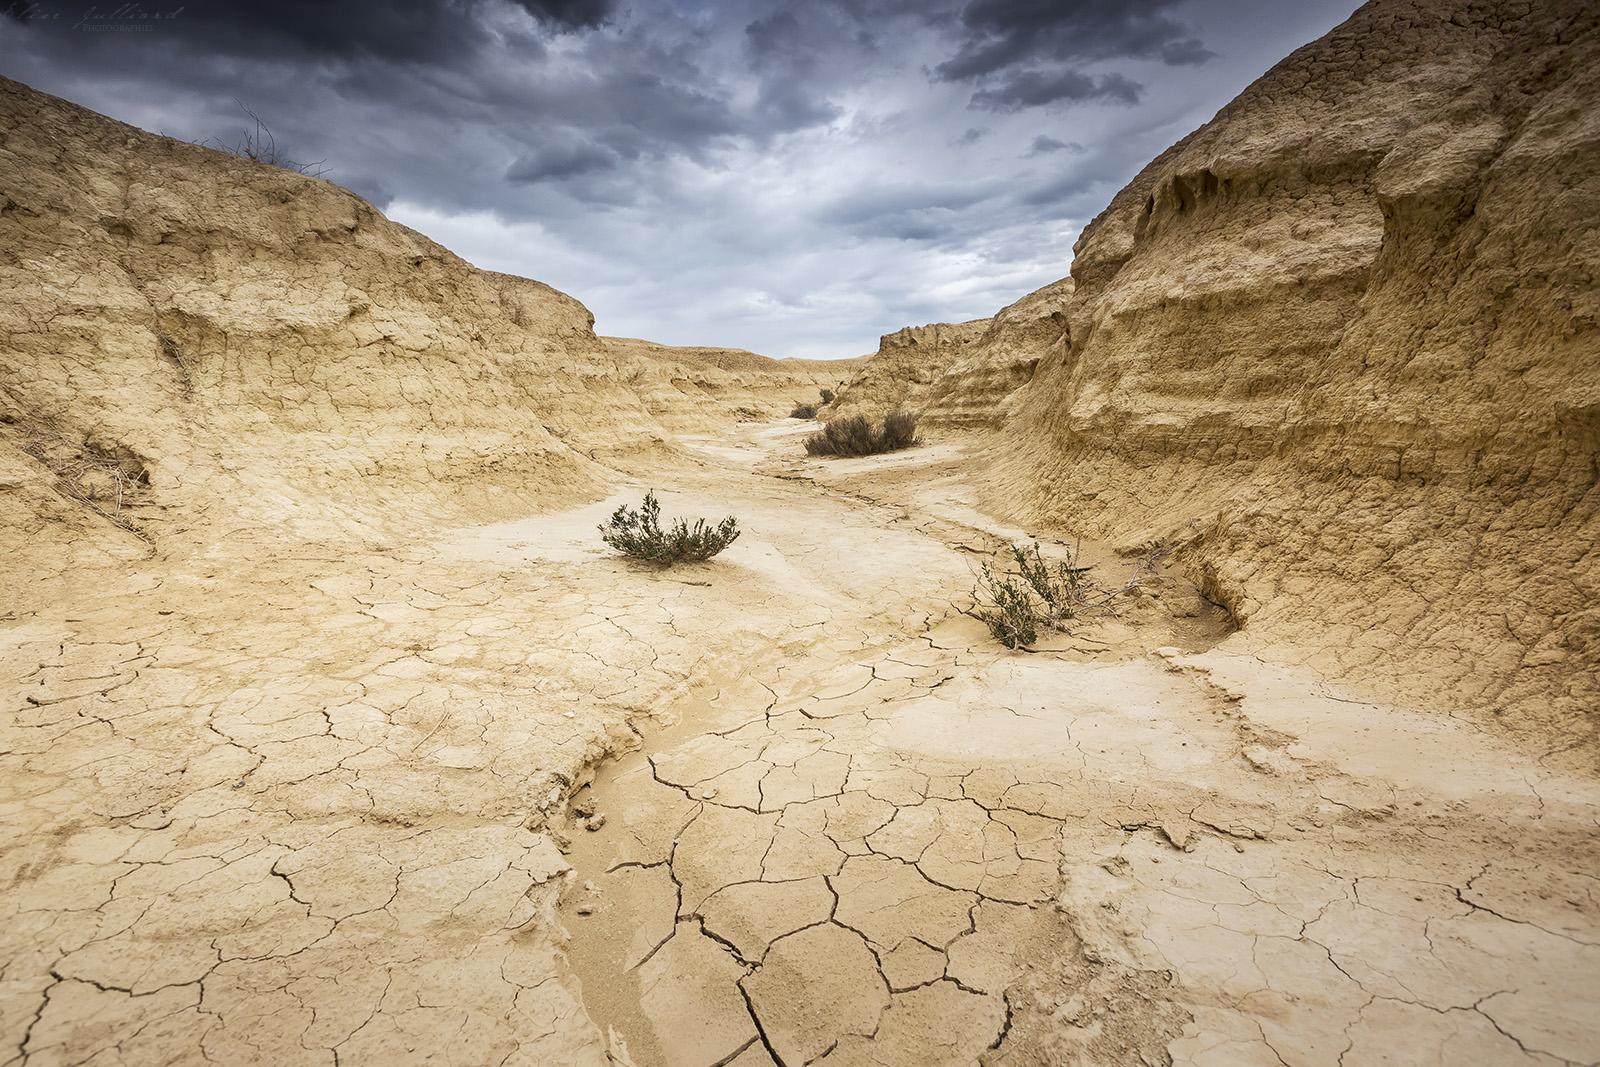 elise-julliard-photographe-lyon-voyage-roadtrip-travel-espagne-aventures-journal-route-tudela-bardenas-reales-navarre-arguedas-desert-paysage-3